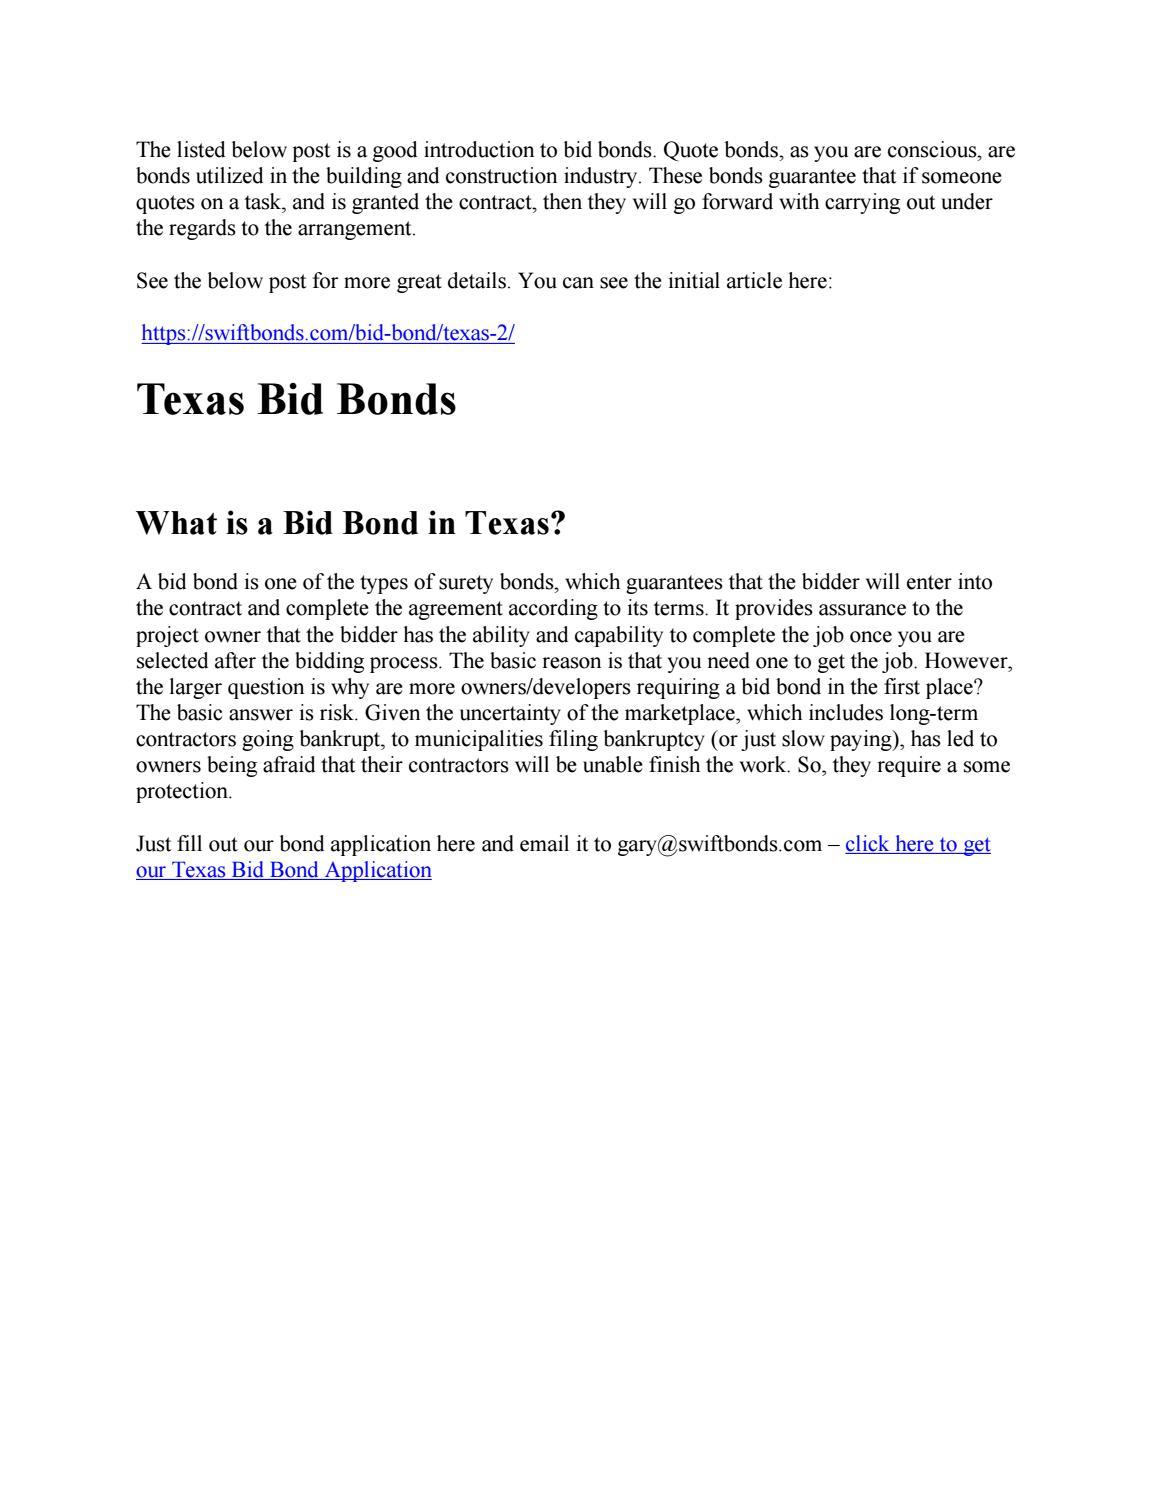 Texas Bid Bonds By Swiftbonds Issuu